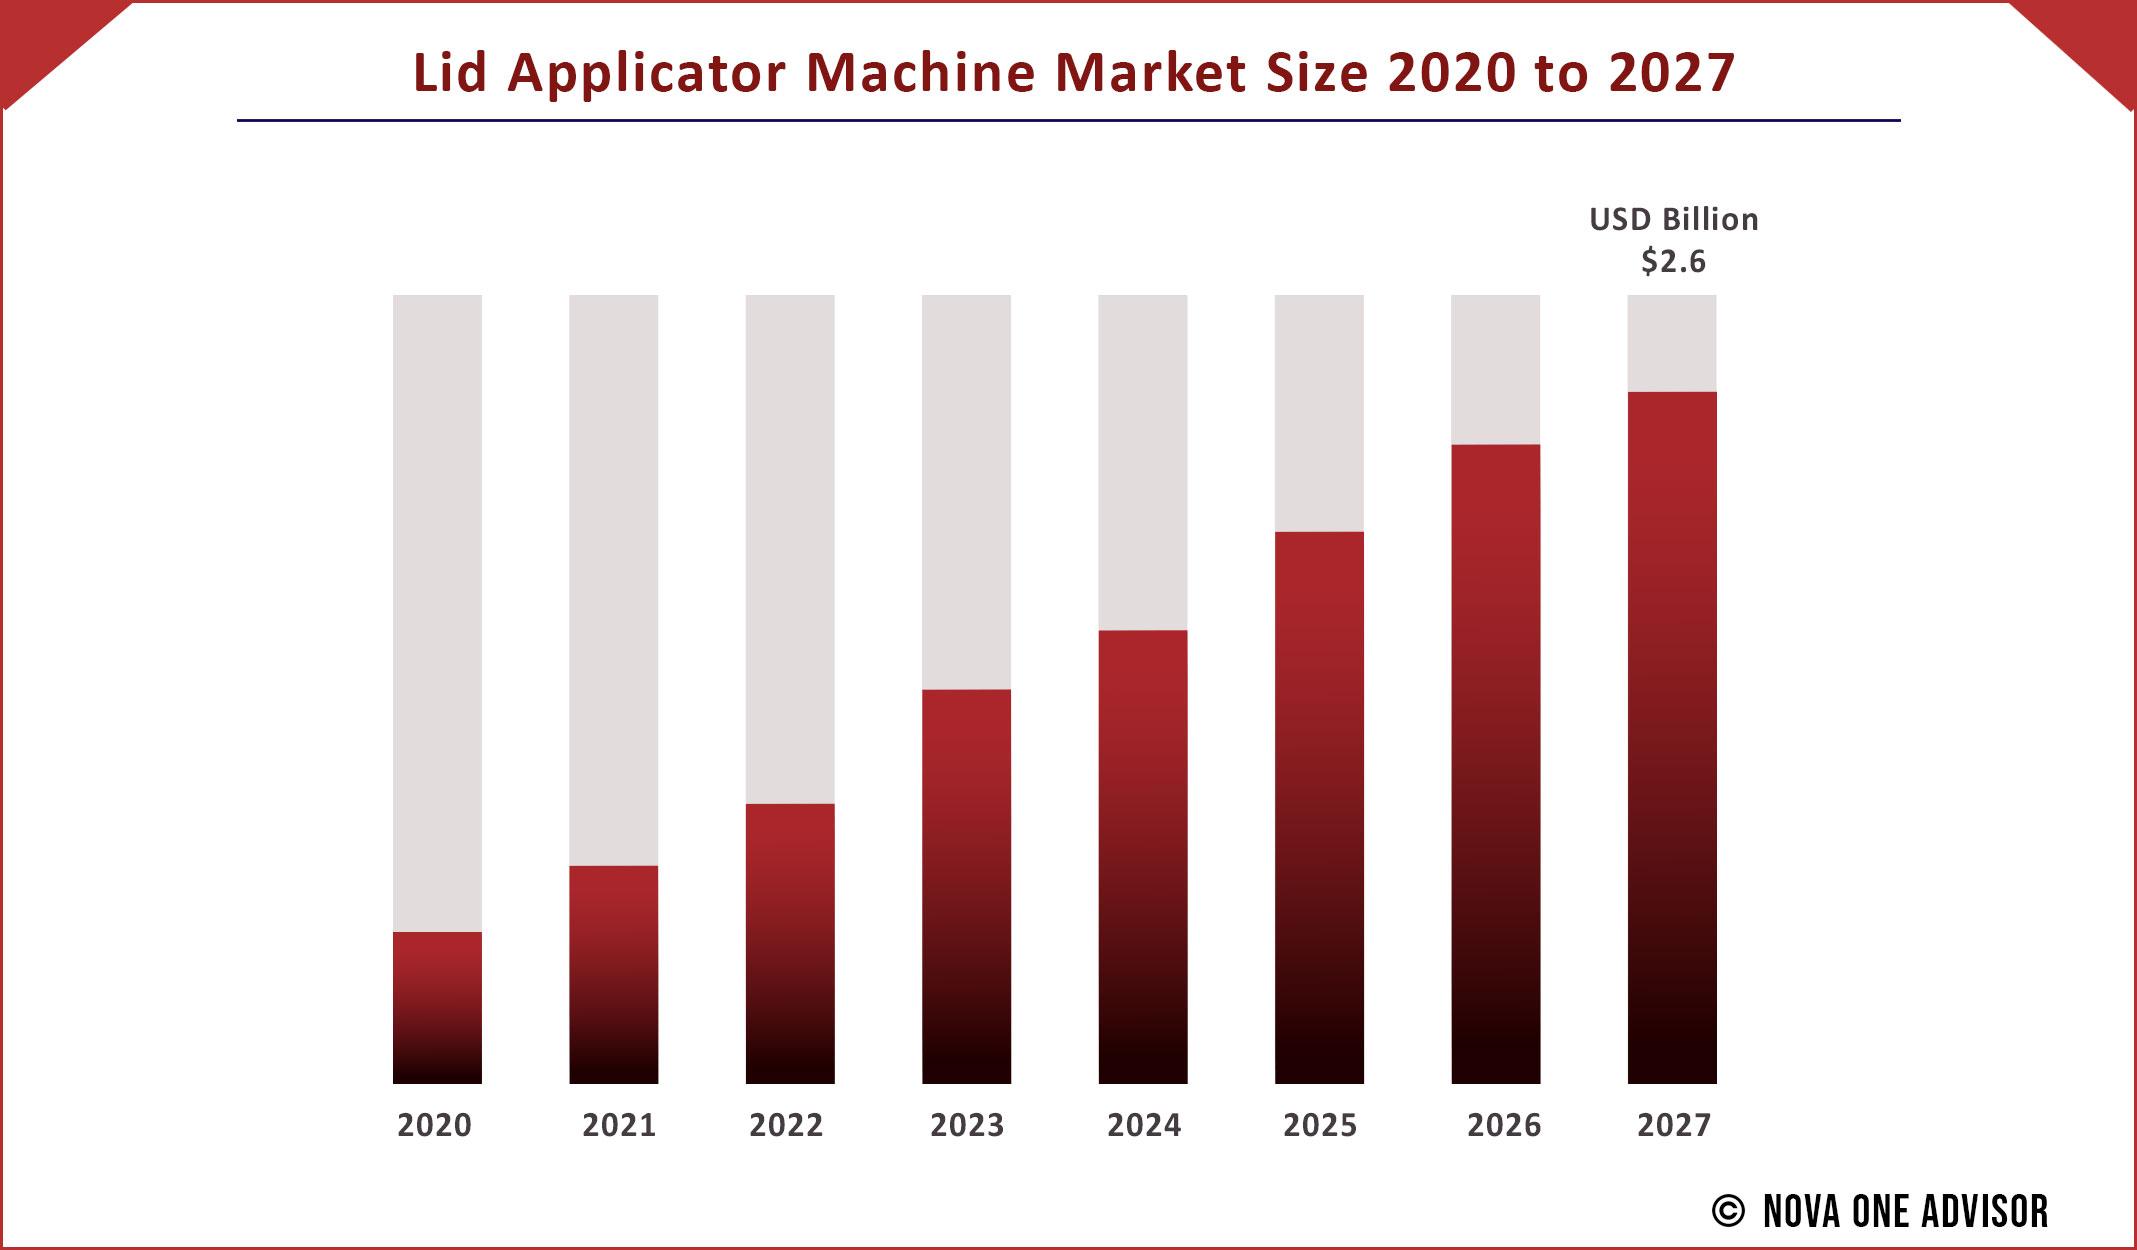 Lid Applicator Machine Market Size 2020 to 2027